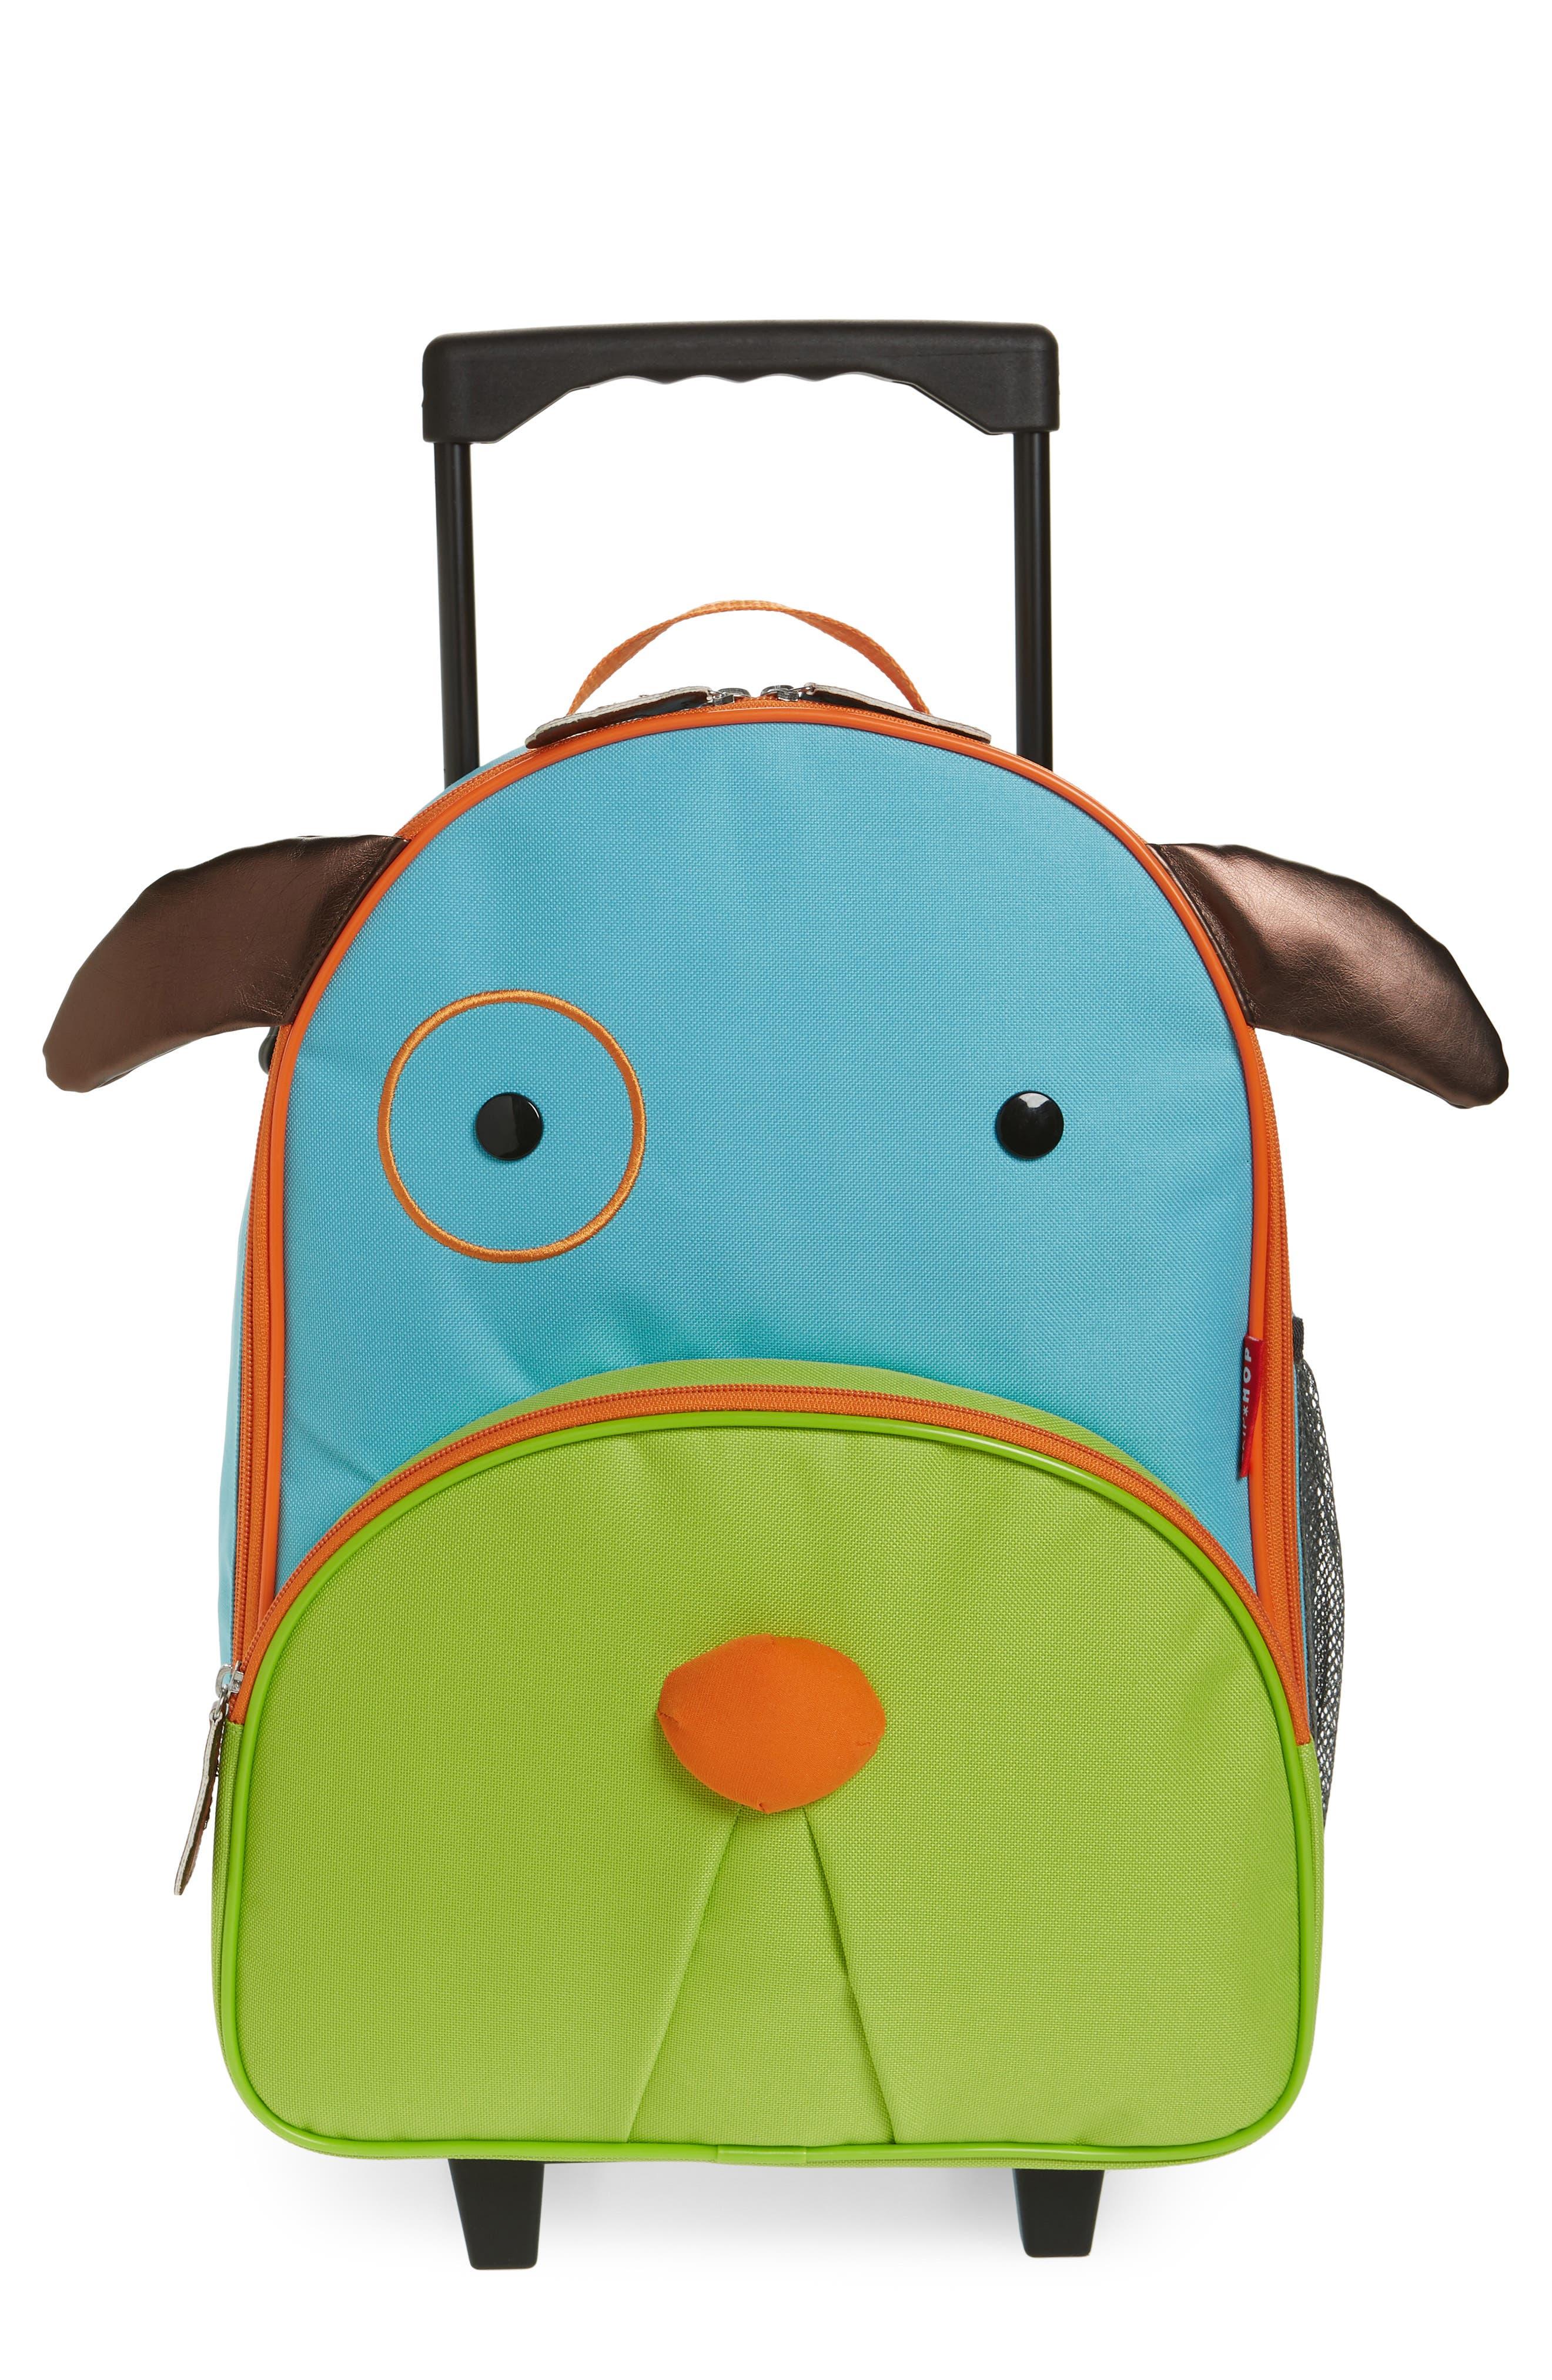 Skip Hop Rolling Luggage (Kids)